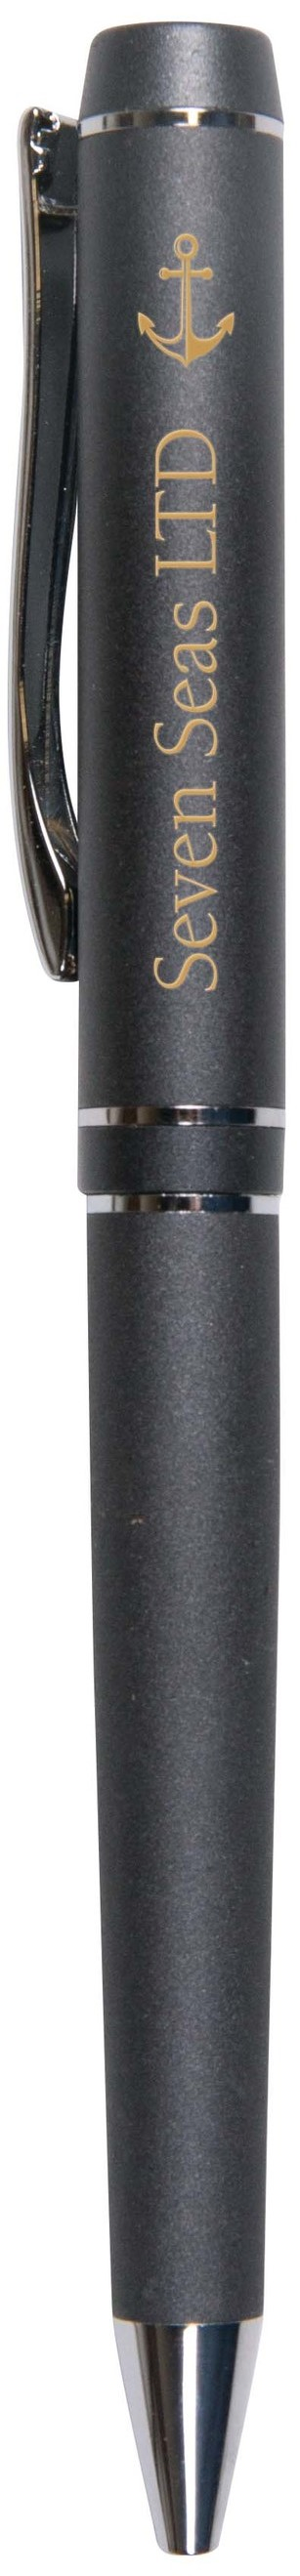 Metal Pen 9